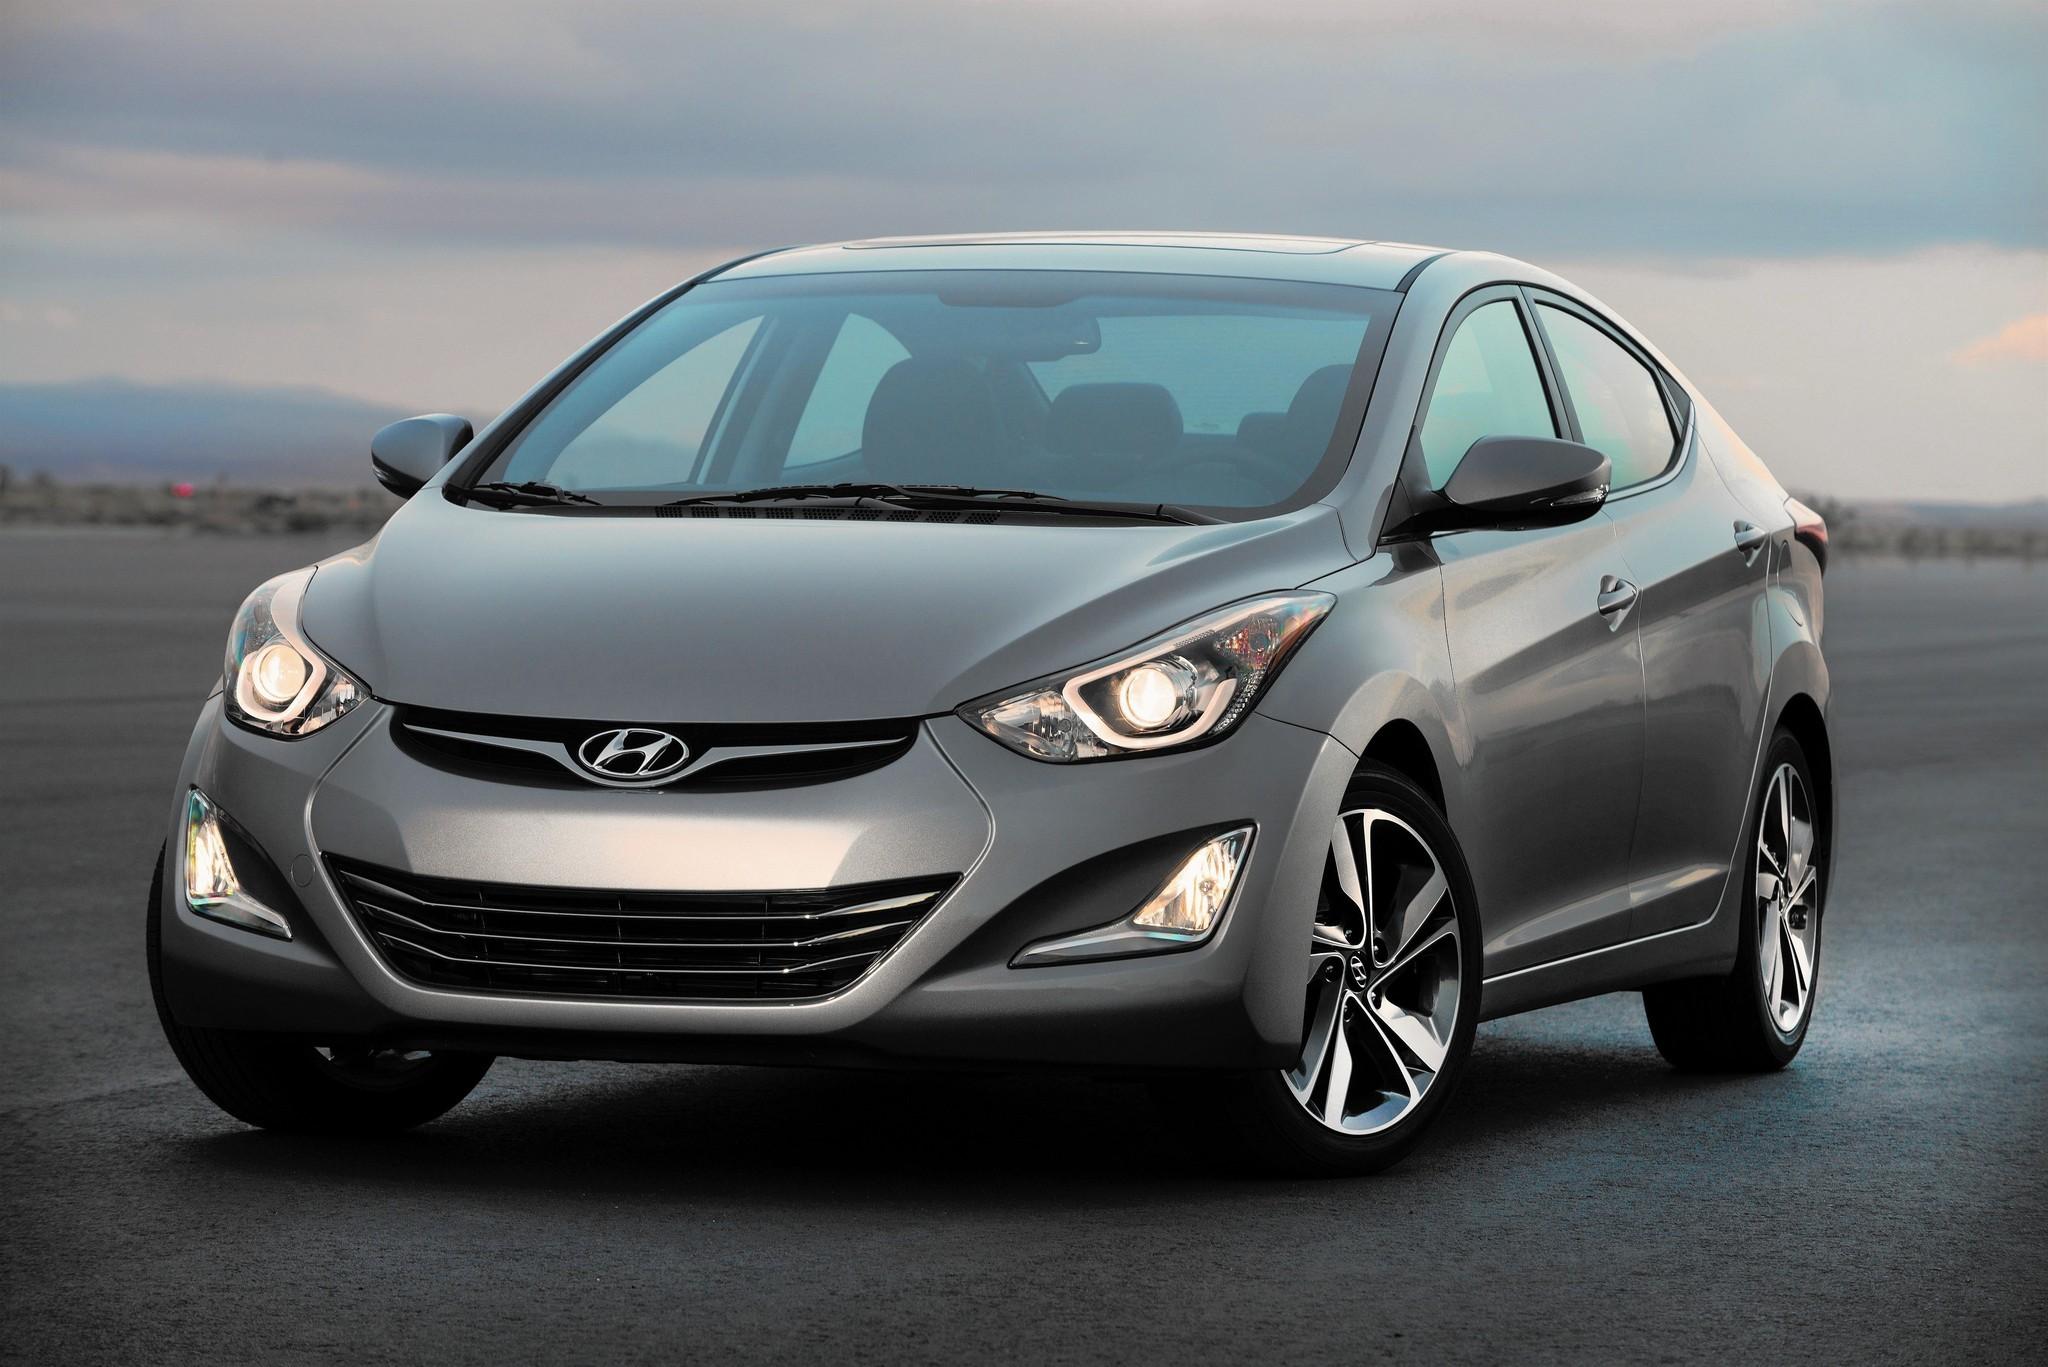 Phillipsburg Easton Hyundai planning move to Lower Nazareth - Lehigh